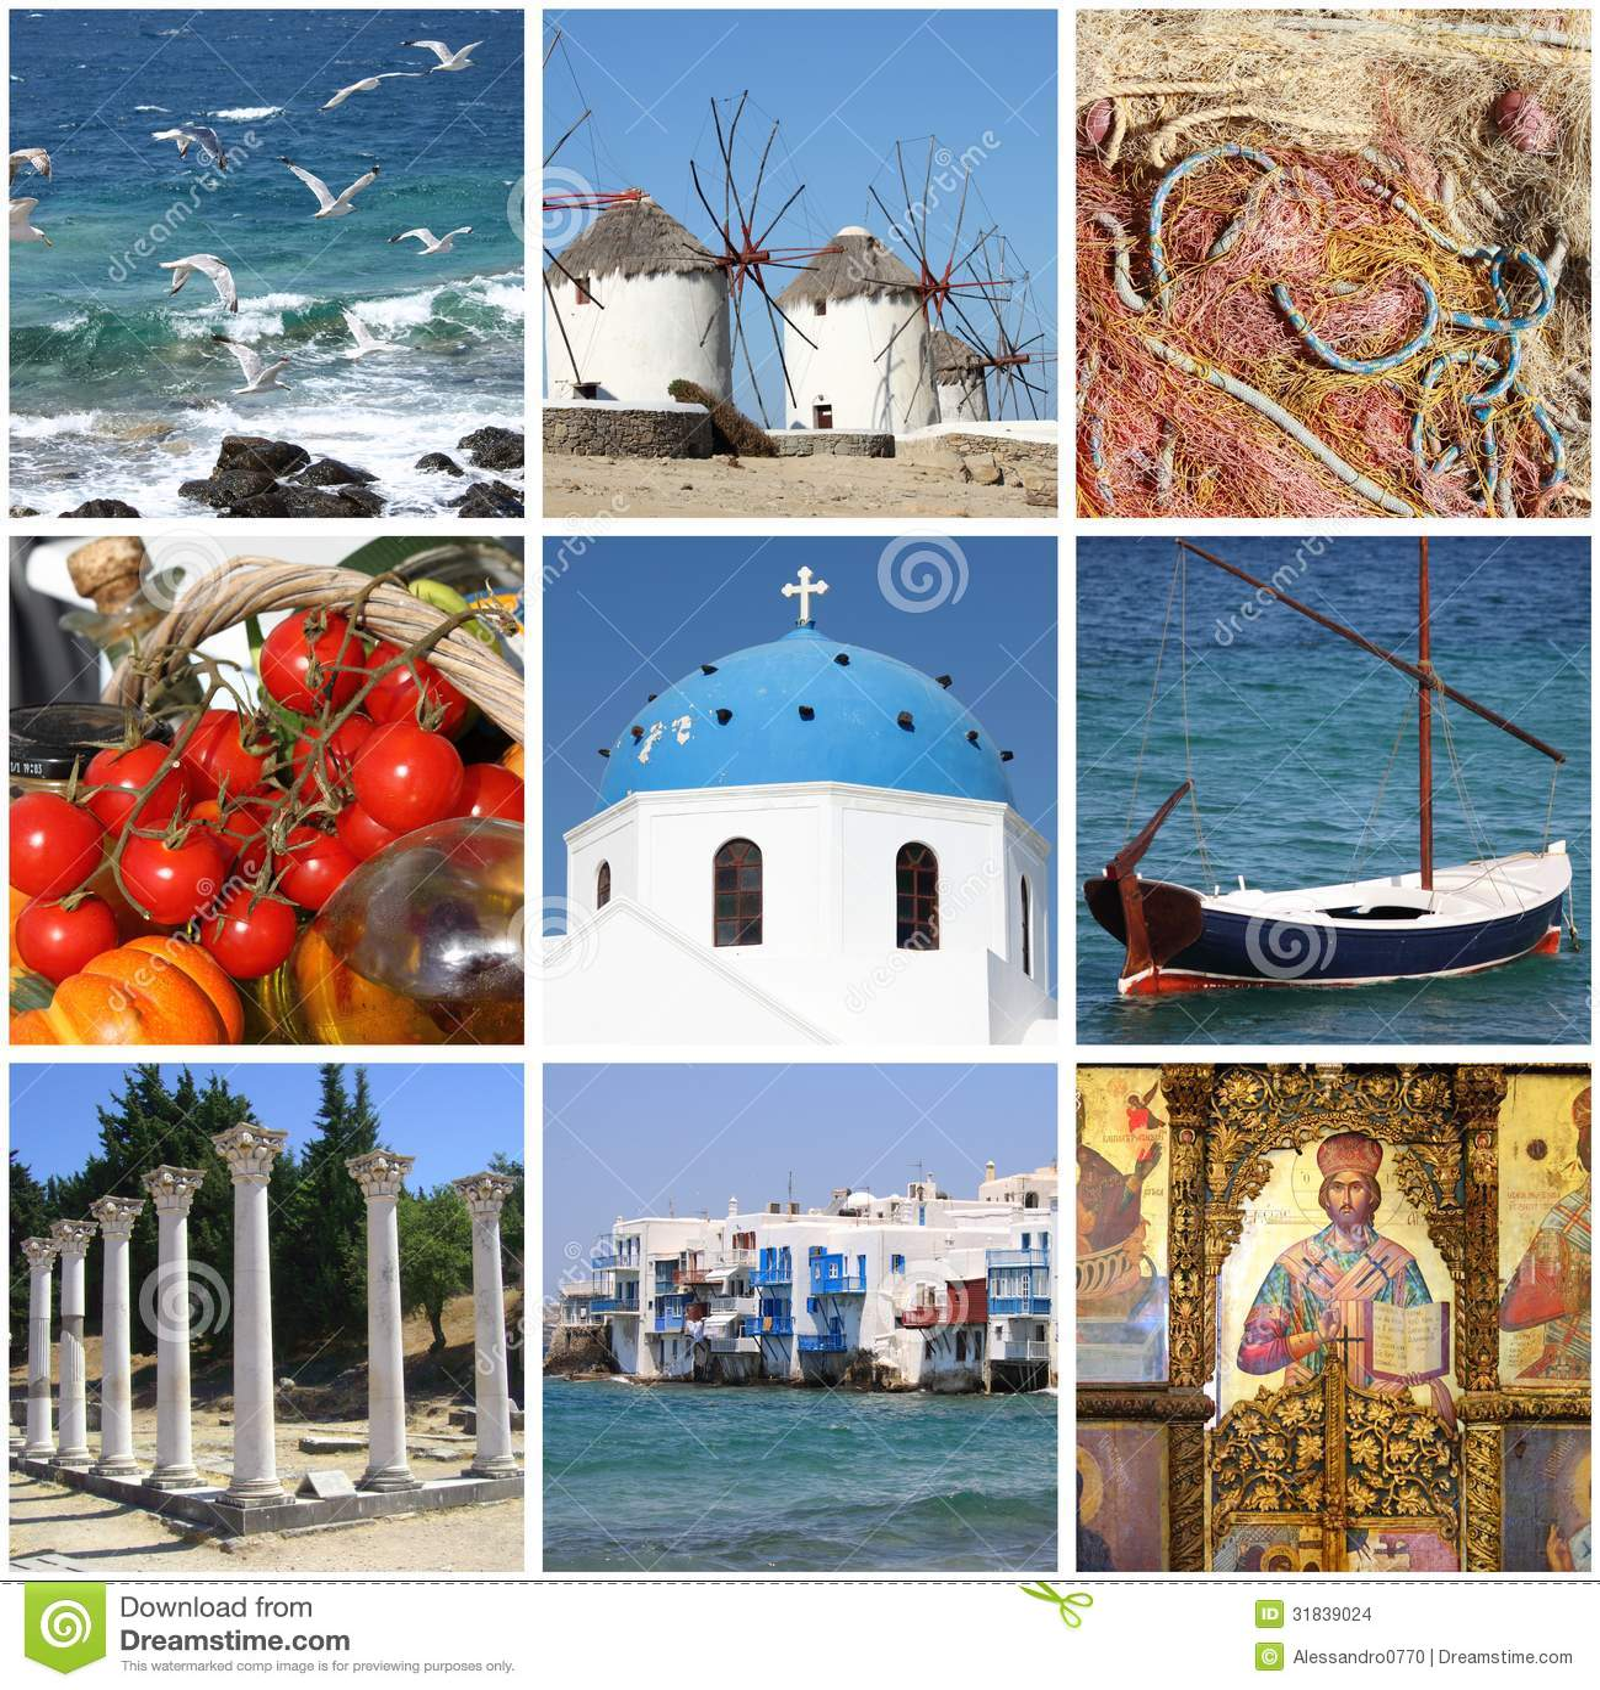 Greece Landmarks Collage Stock Images - Image: 31839024